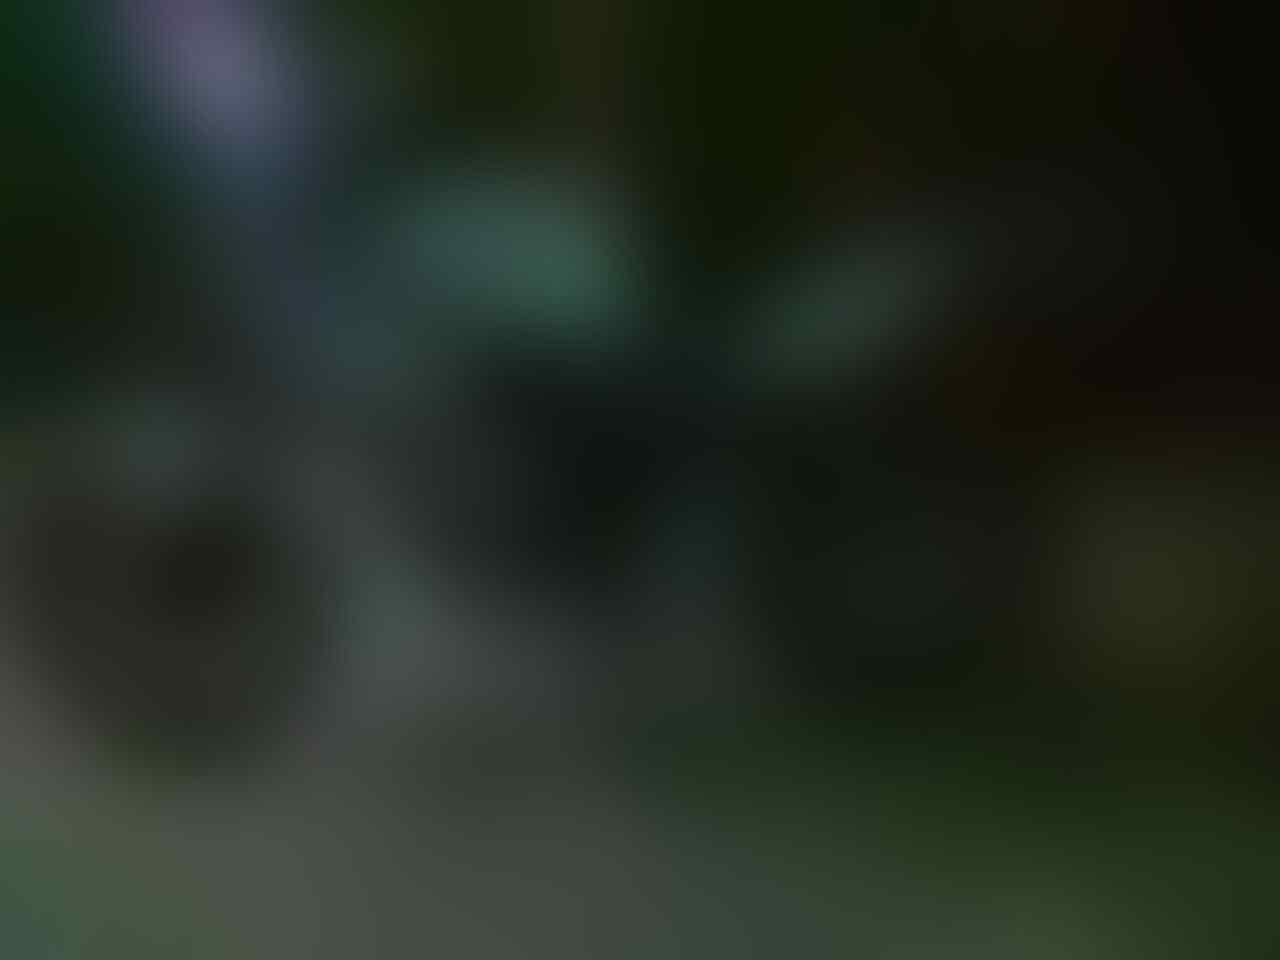 Honda Cb150r Streetfire Club On Kaskus Page 258 All New Cb 150r Stallion Black Bekasi Hosticus